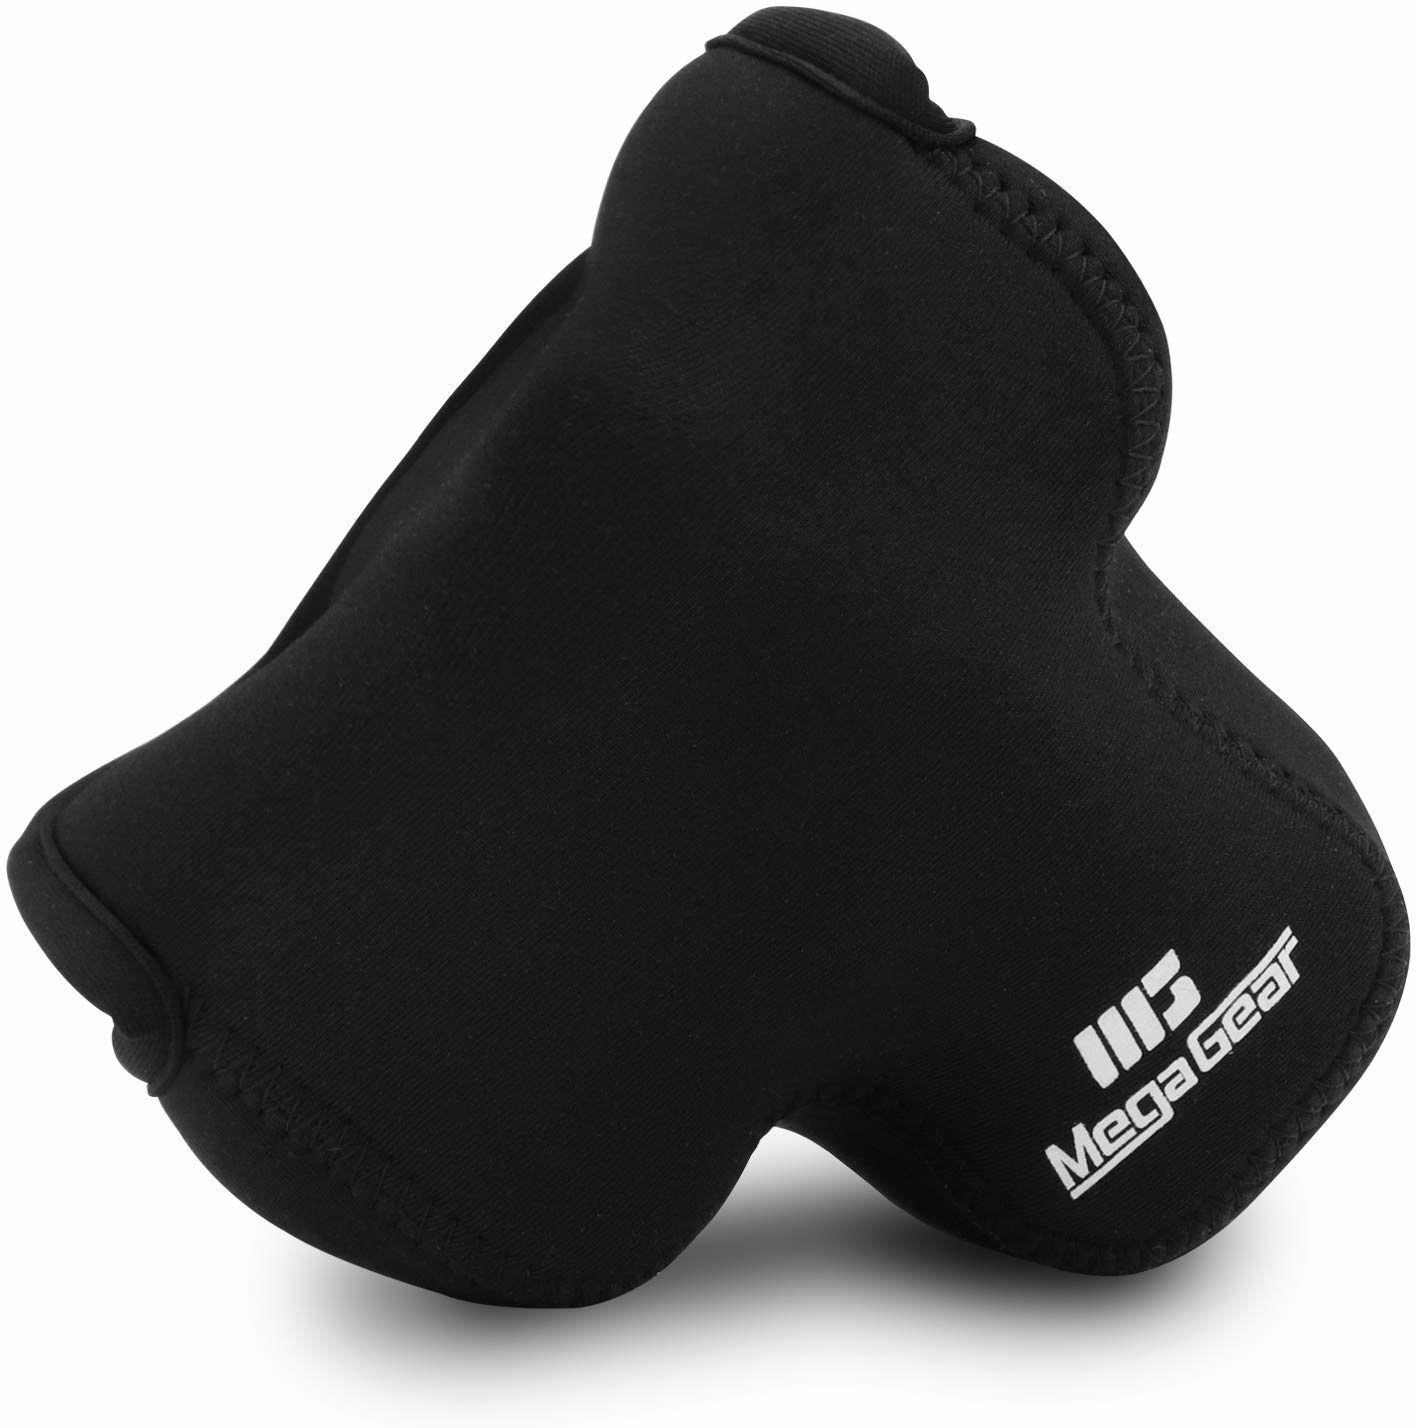 MegaGear MG1036 Canon EOS M50, M5 (15-45) ultralekka torba na aparat z neoprenu - czarna